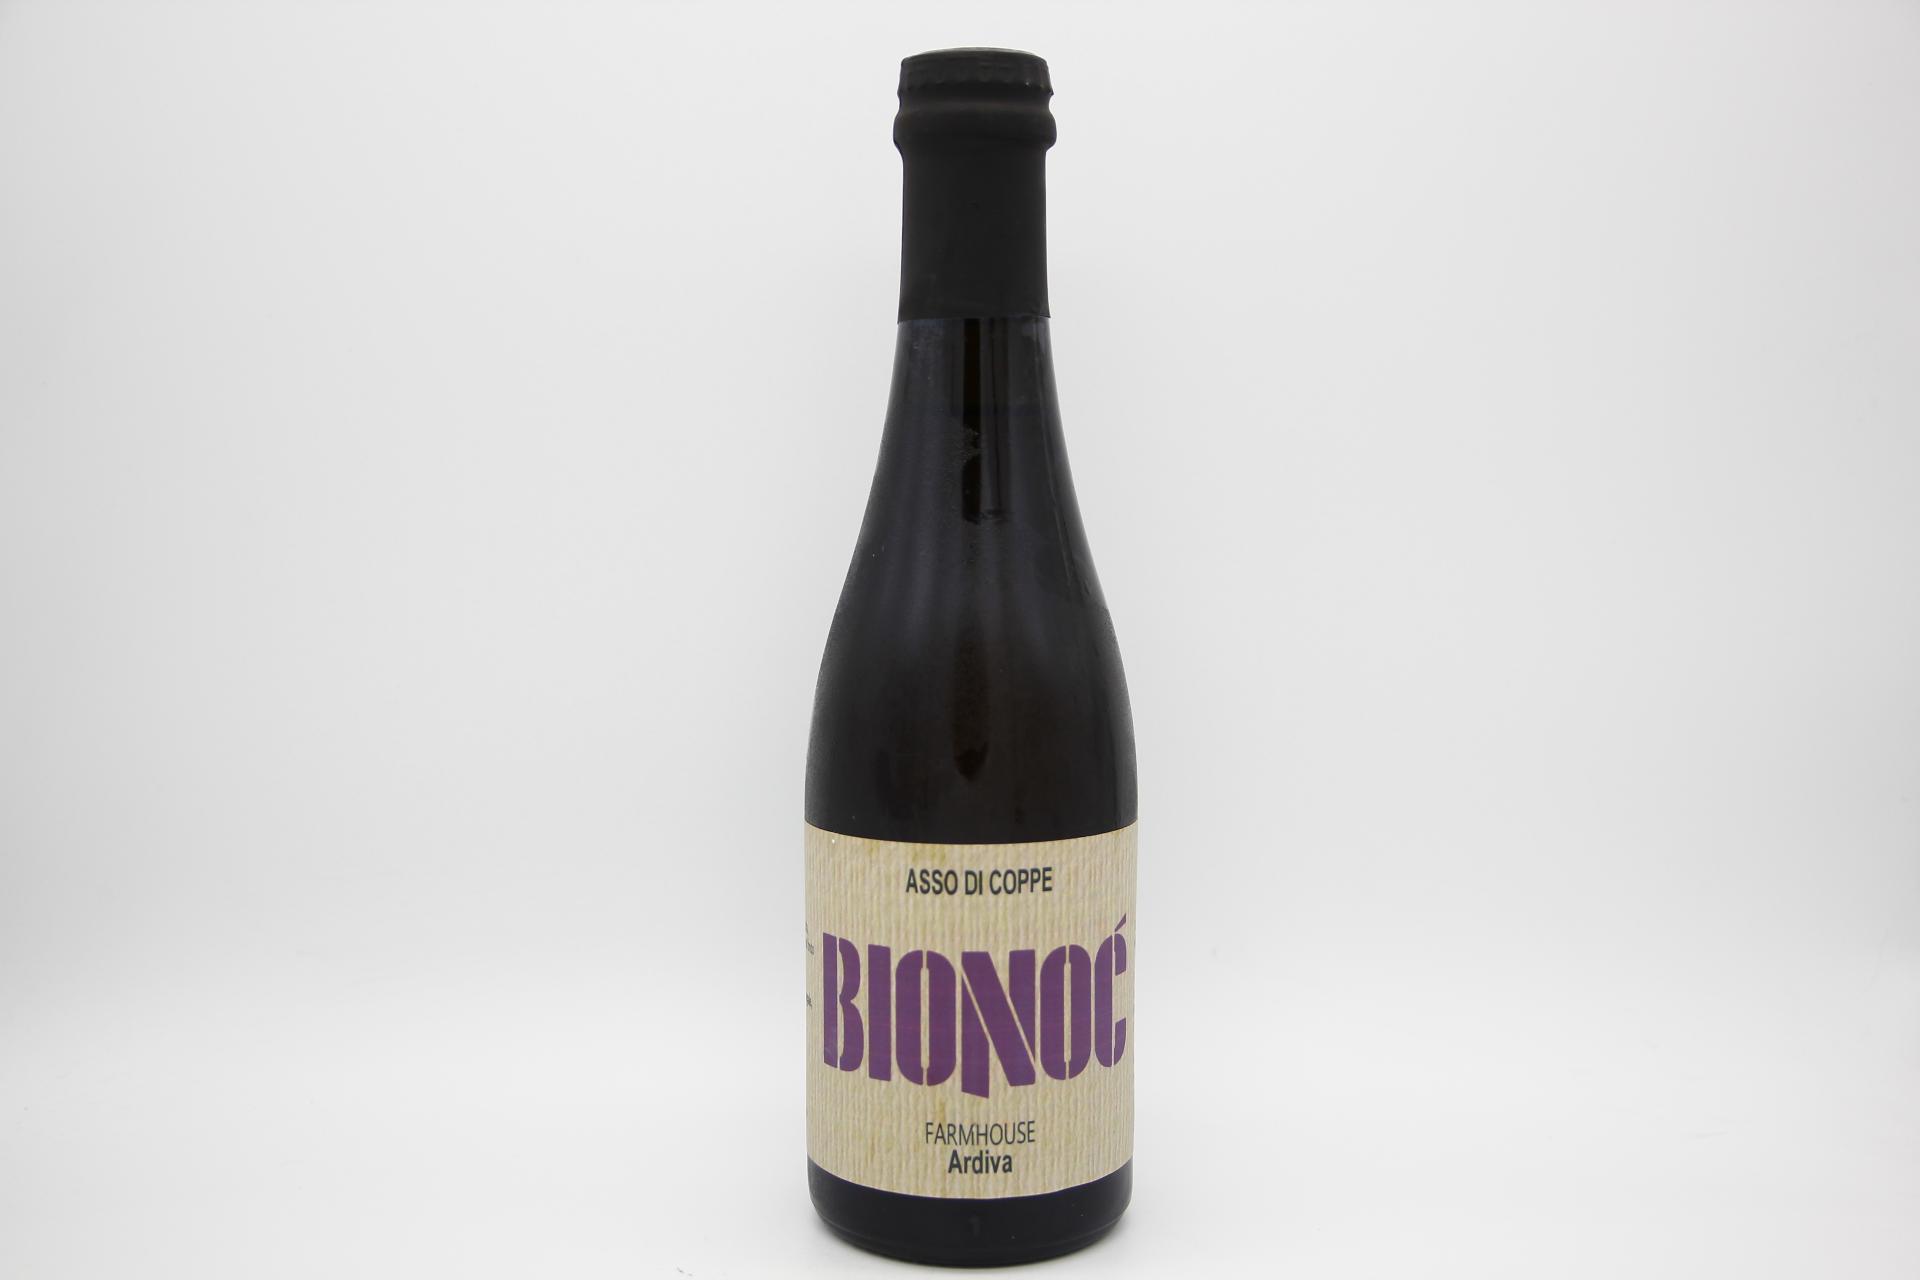 BIONOC - ARDIVA 37,5cl